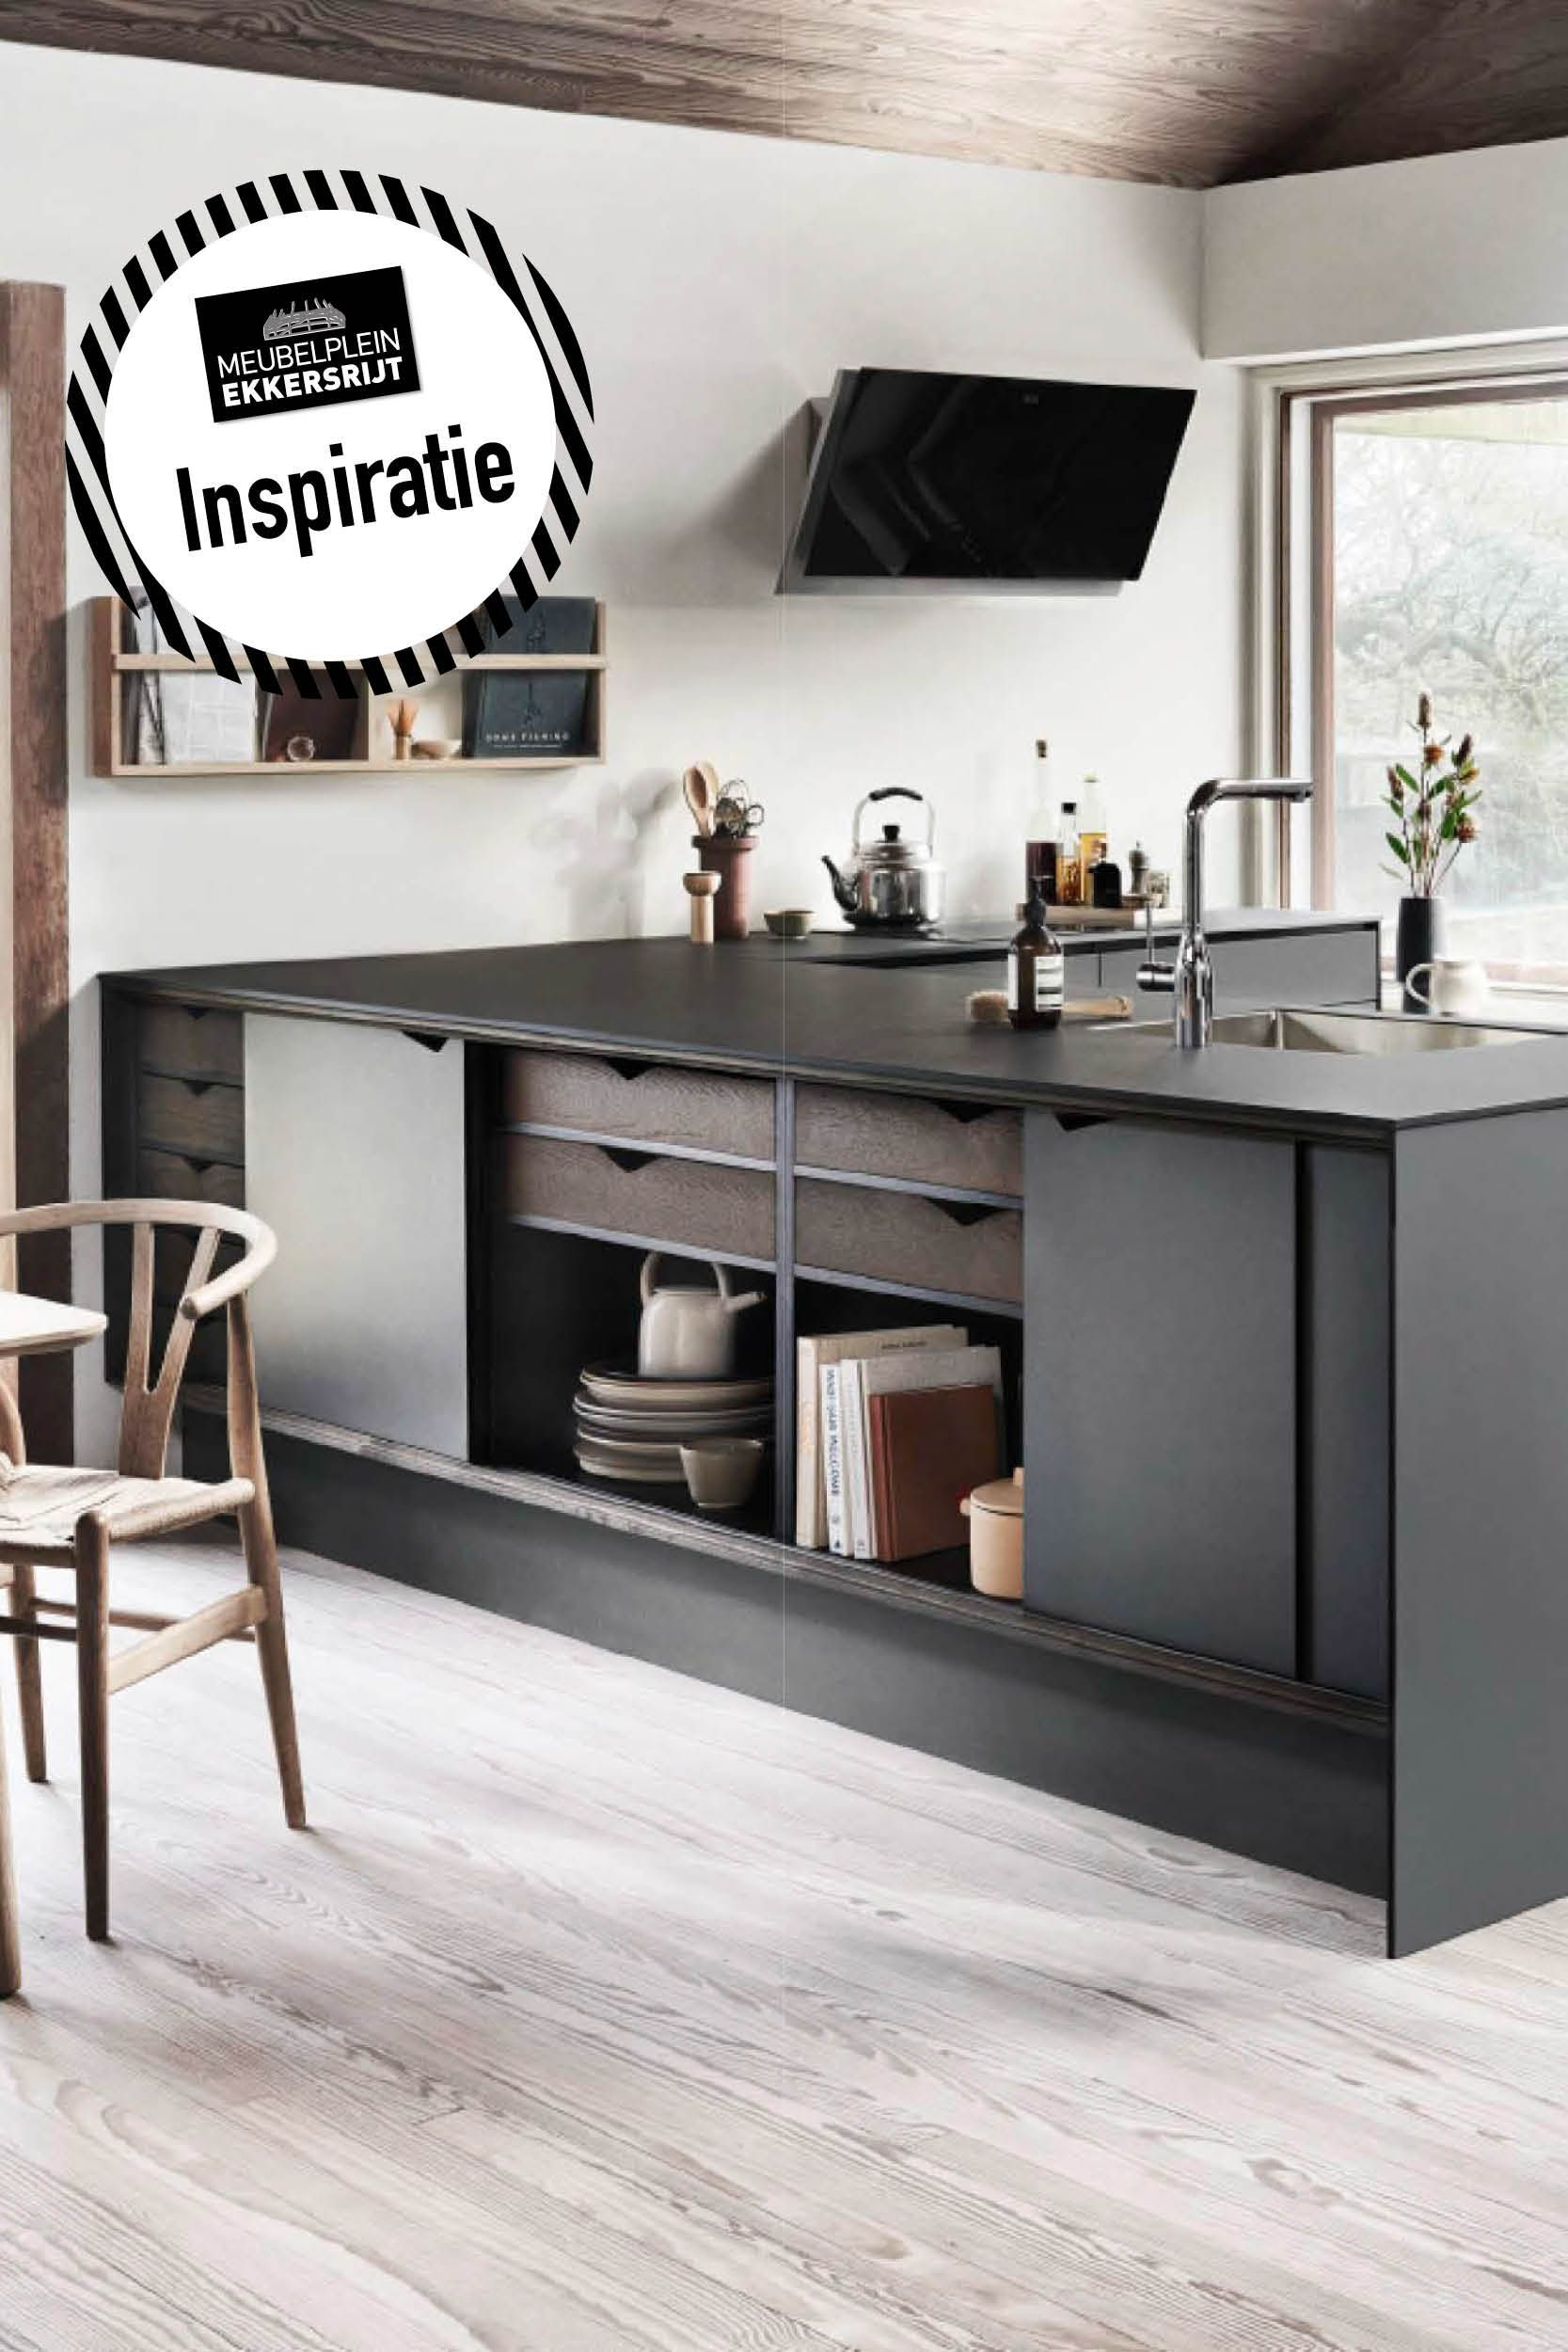 3x Timeless Kitchen Trends In 2020 Kitchen Trends Timeless Kitchen Kitchen Inspirations